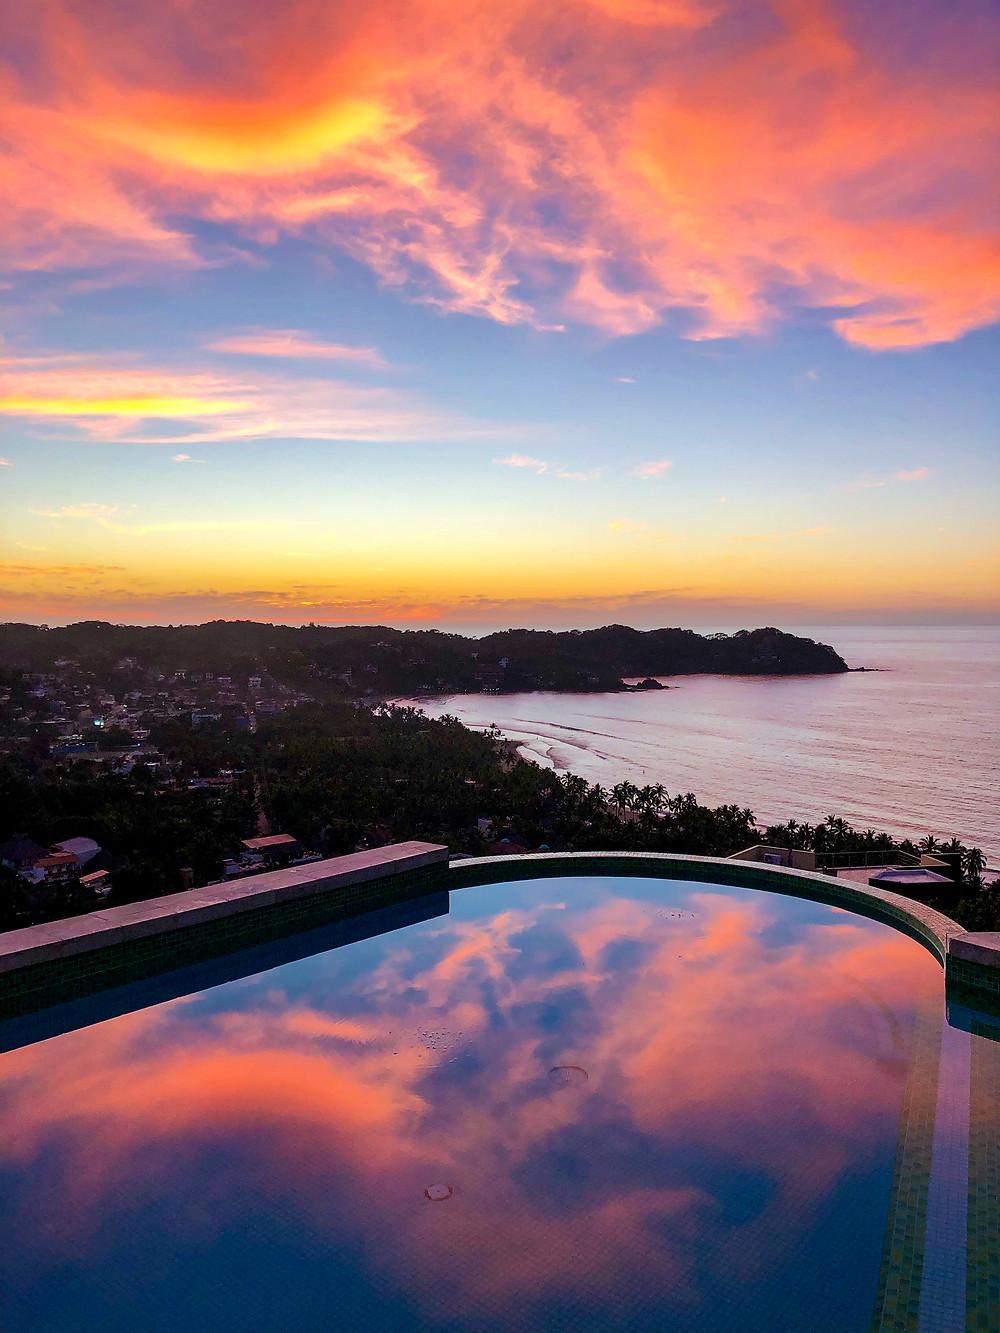 Sayulita Mexico sunset